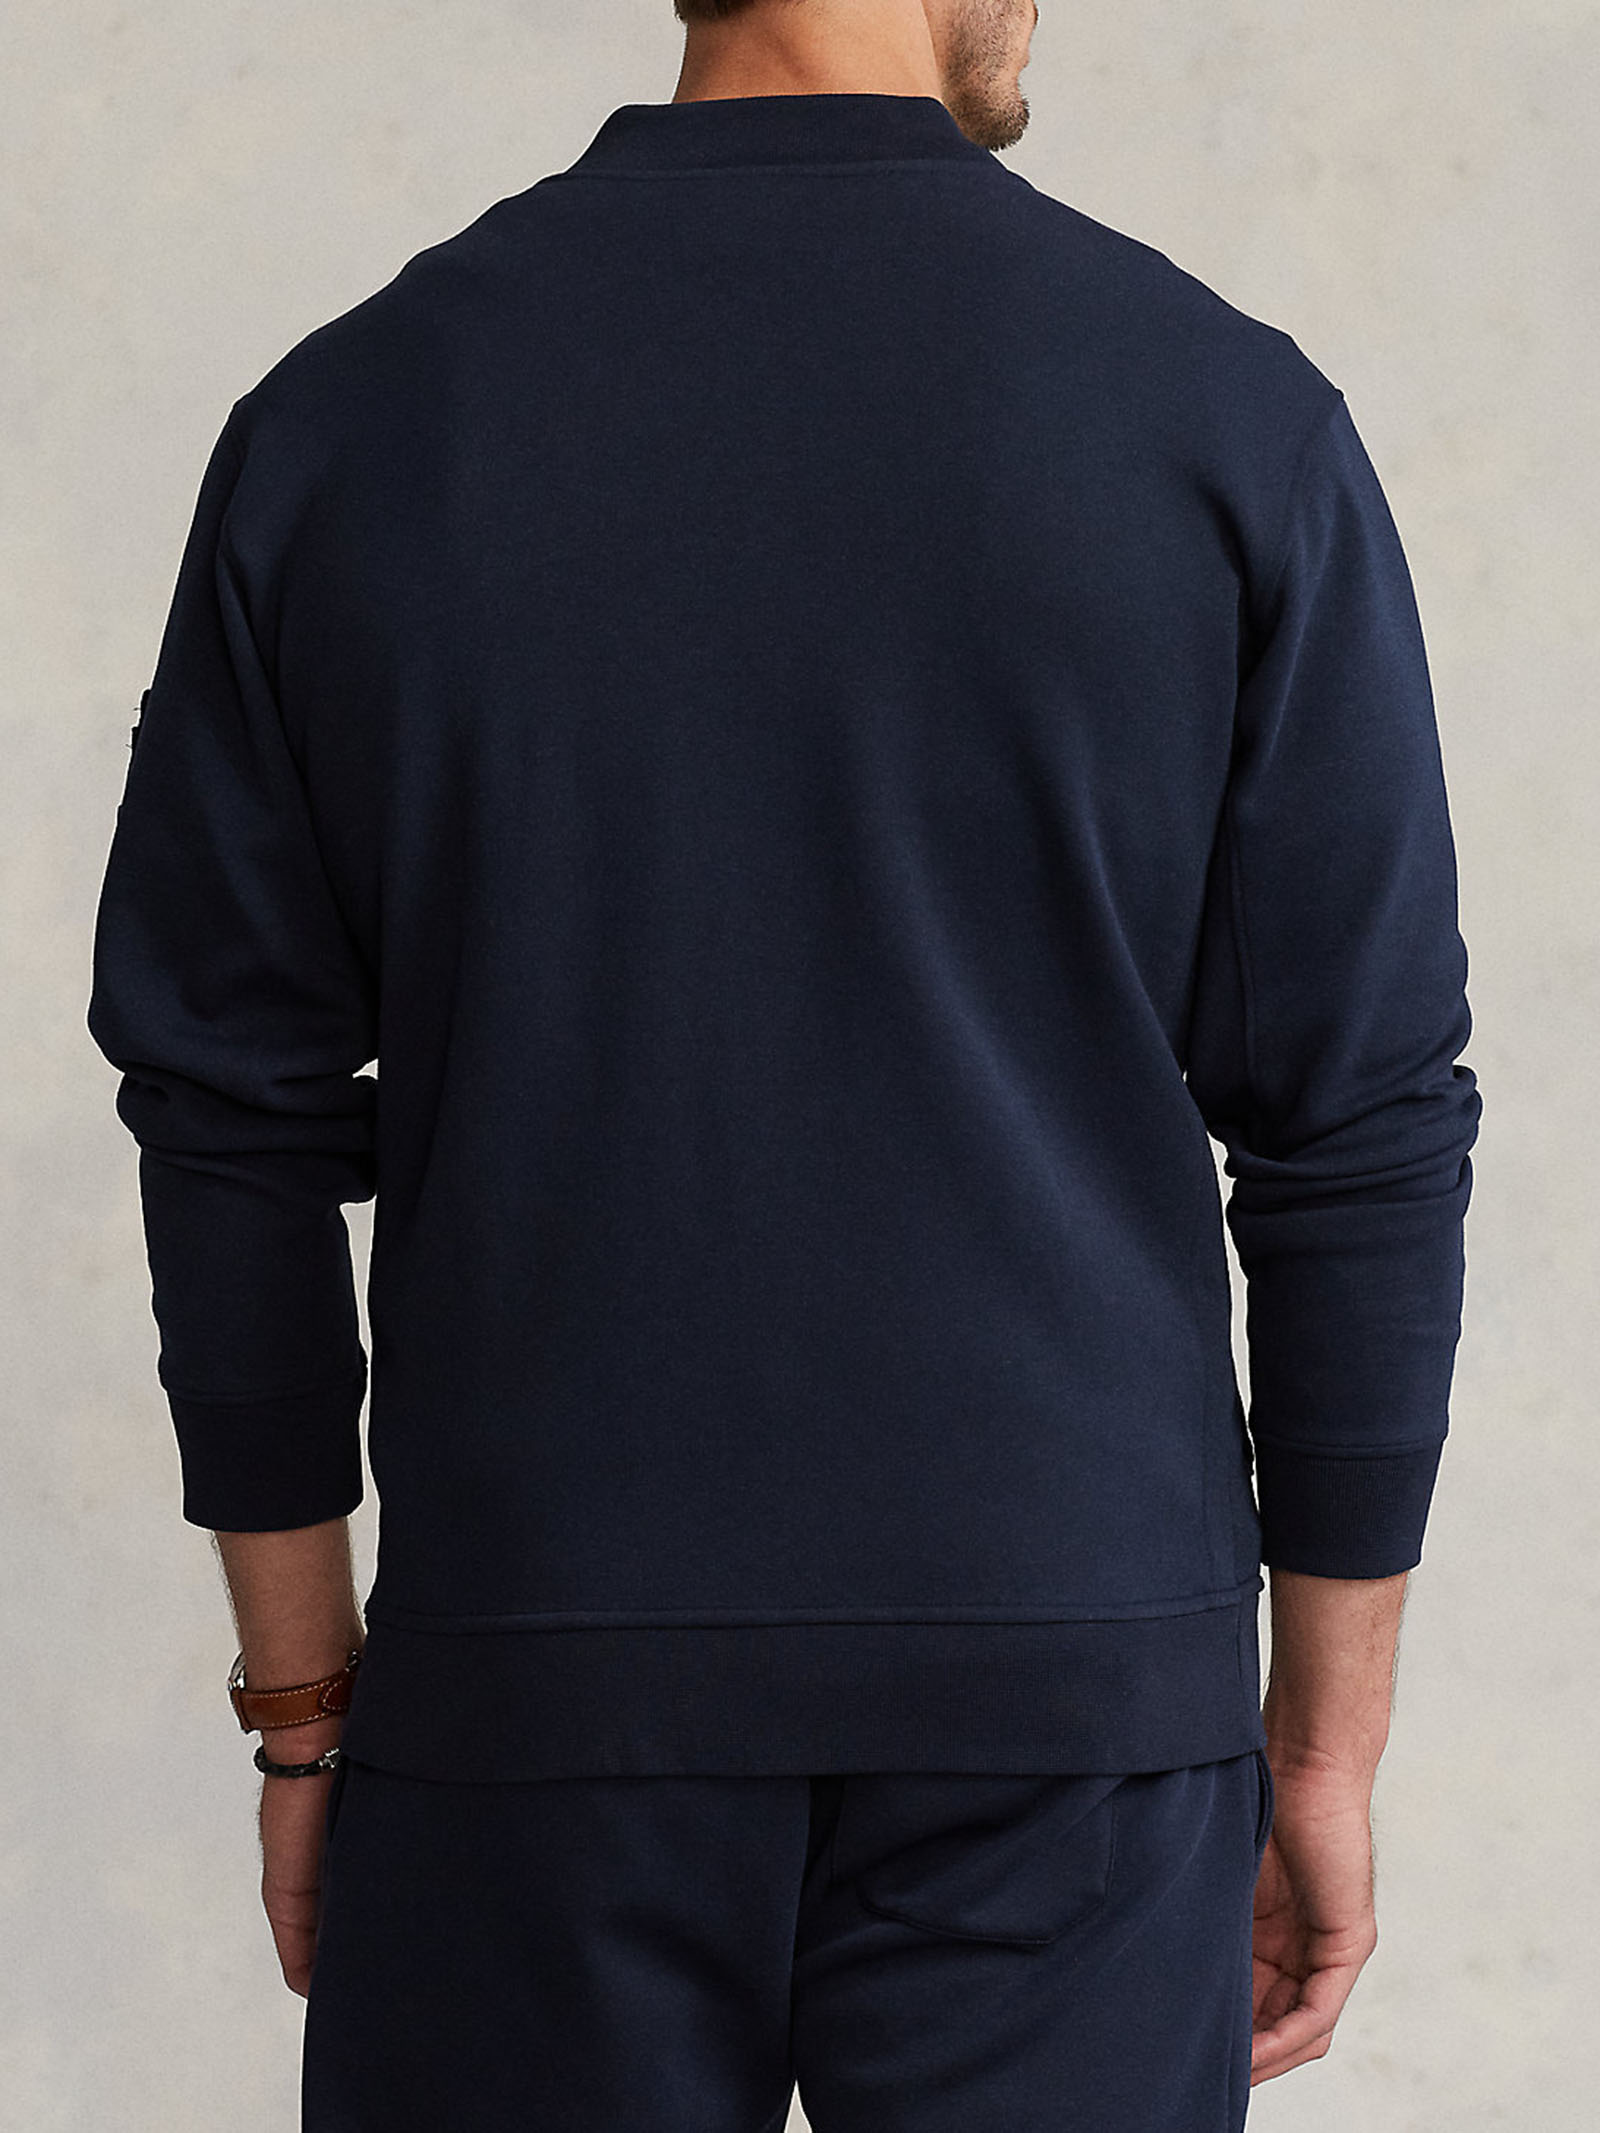 Bomber a maglia doppia RALPH LAUREN | Felpa | 710-849528002